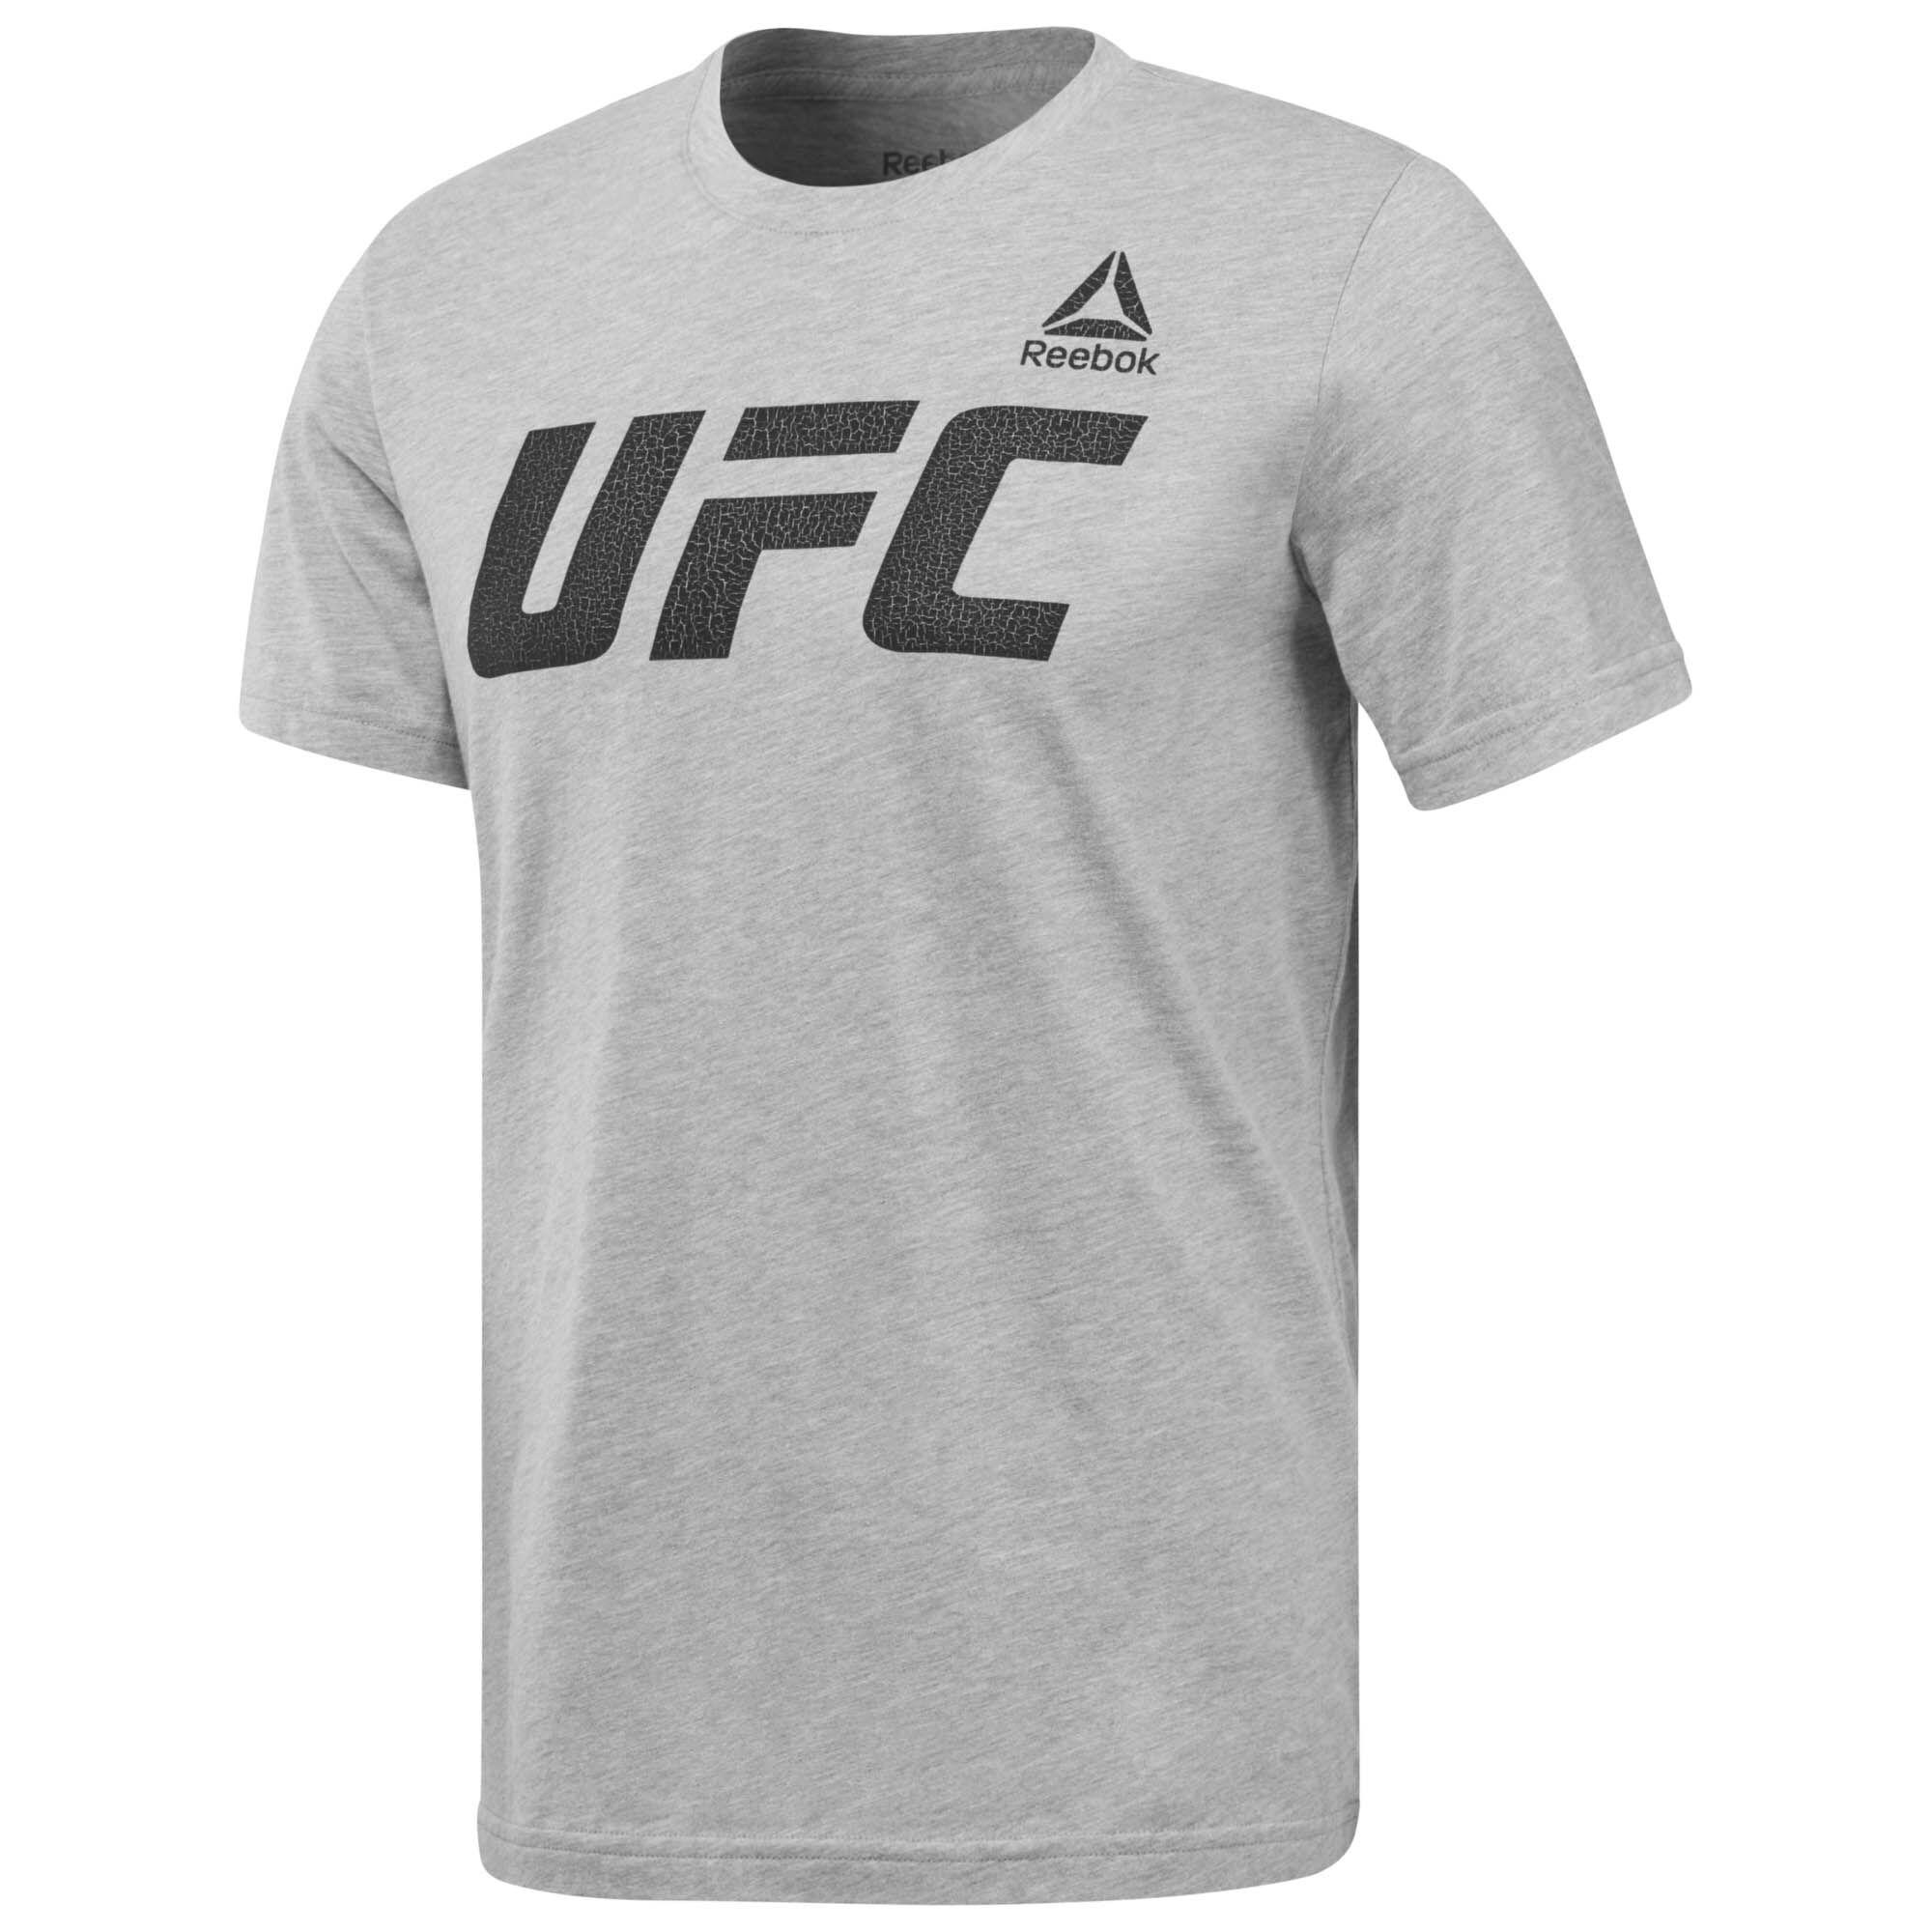 Reebok - UFC Graphic T-Shirt Medium Grey Heather CG0633